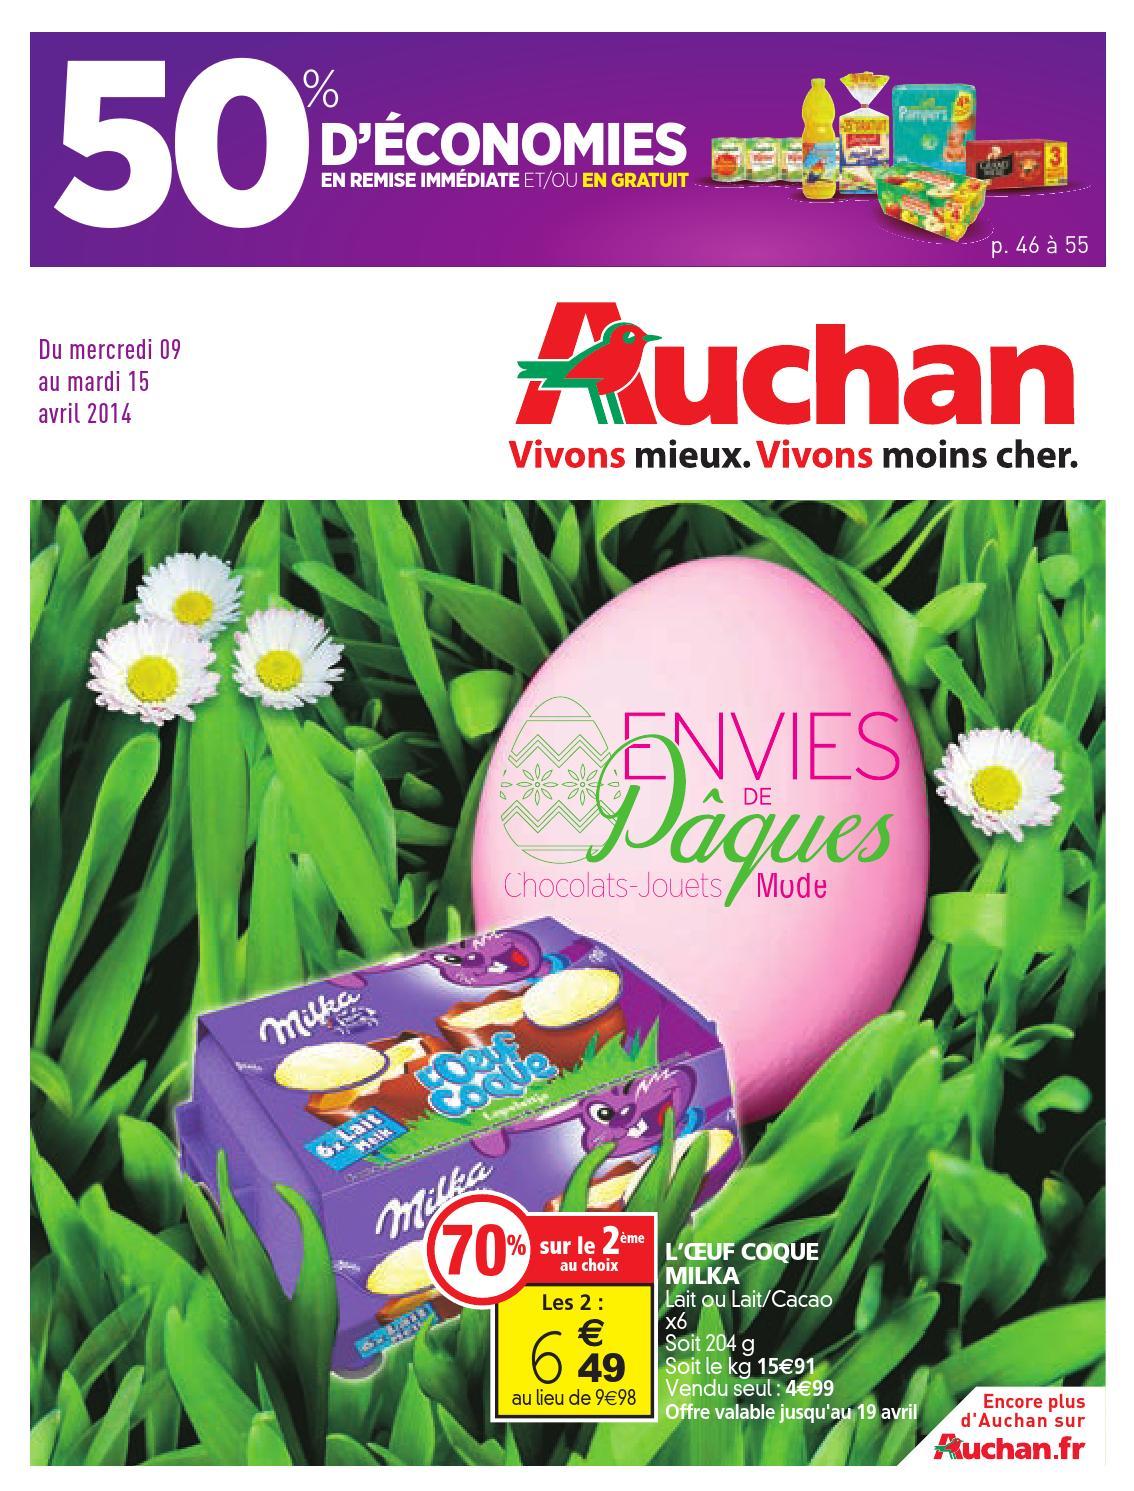 Au Catalogue Avril Issuu 15 Anti By 9 Du Auchan vmNO08nw